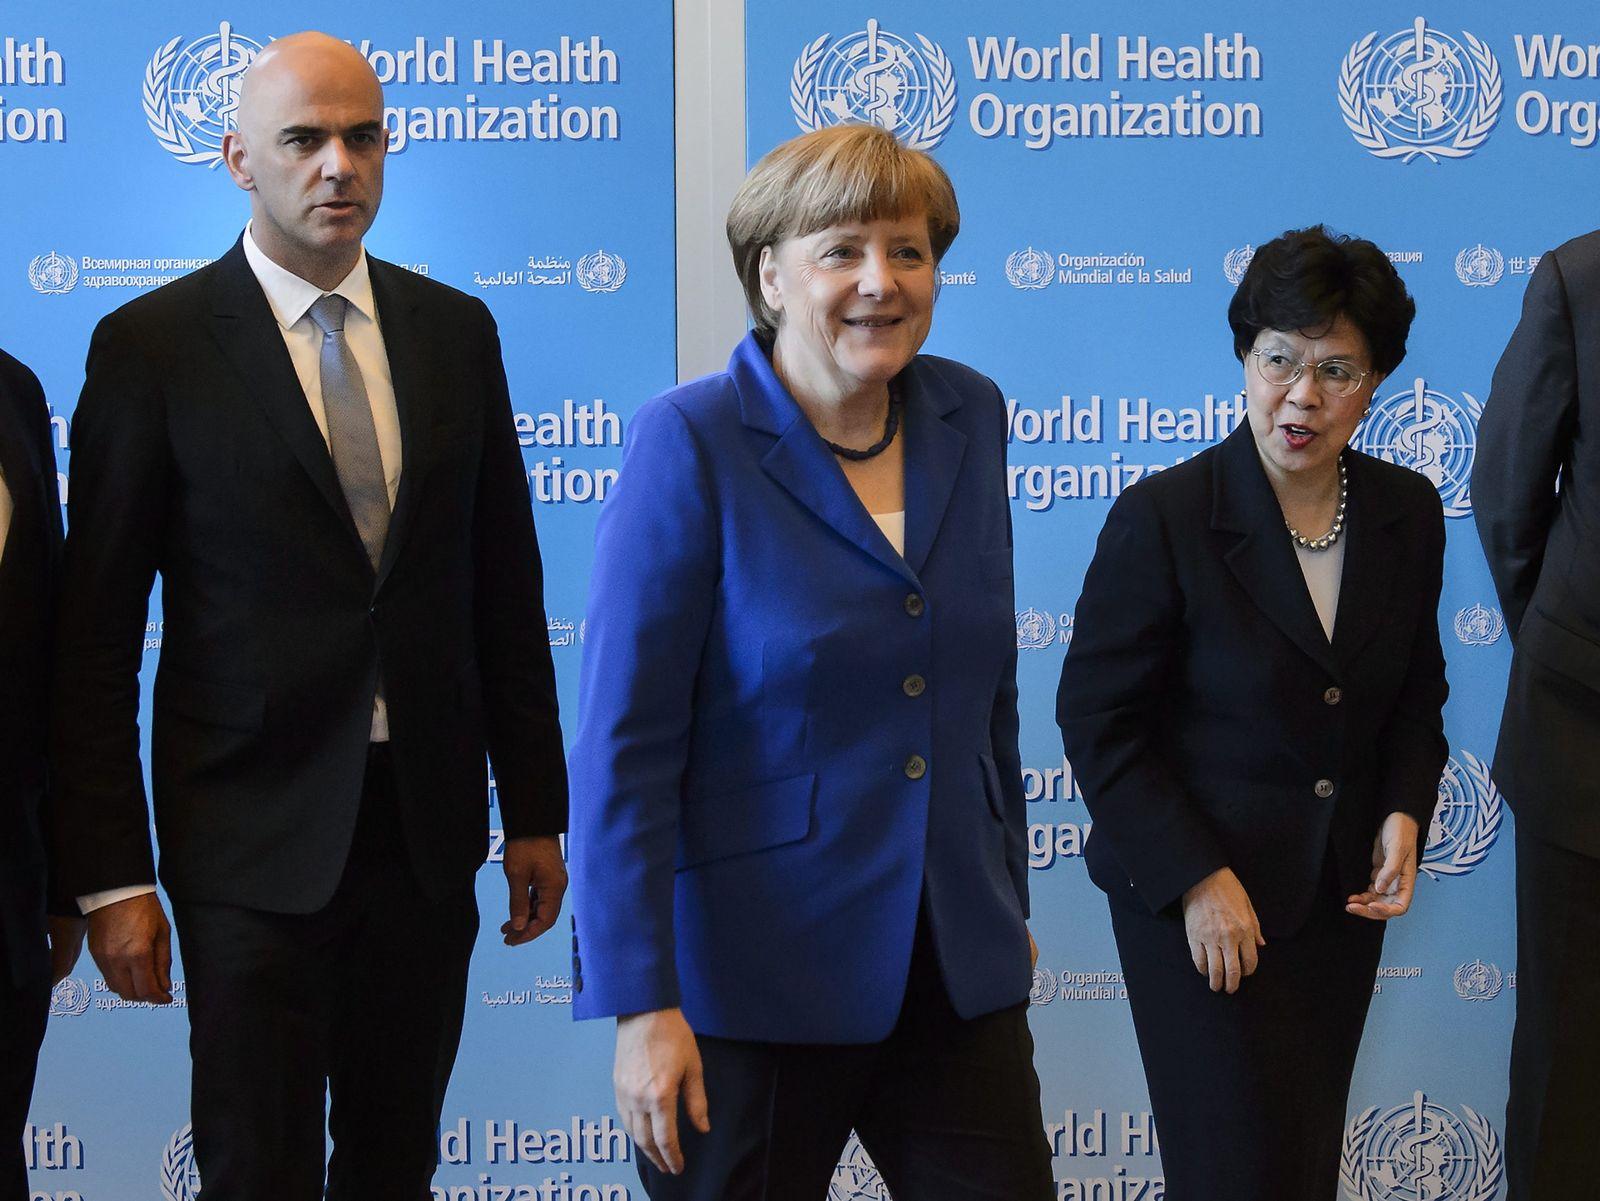 WHO / Gentf / Merkel